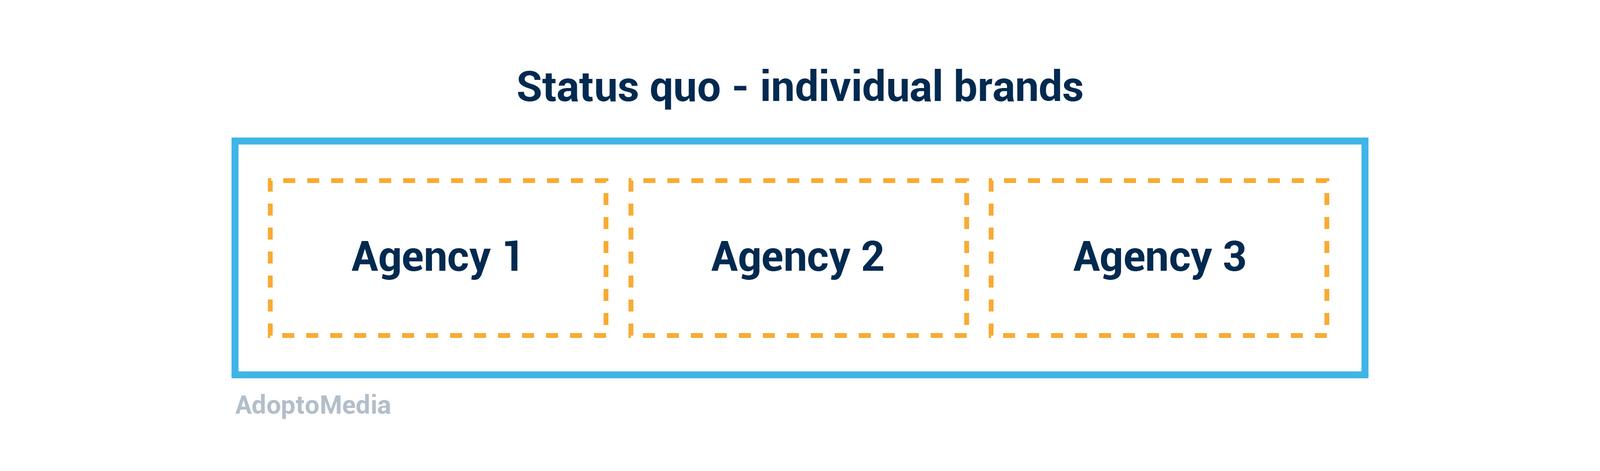 agency model, integration, individual brands